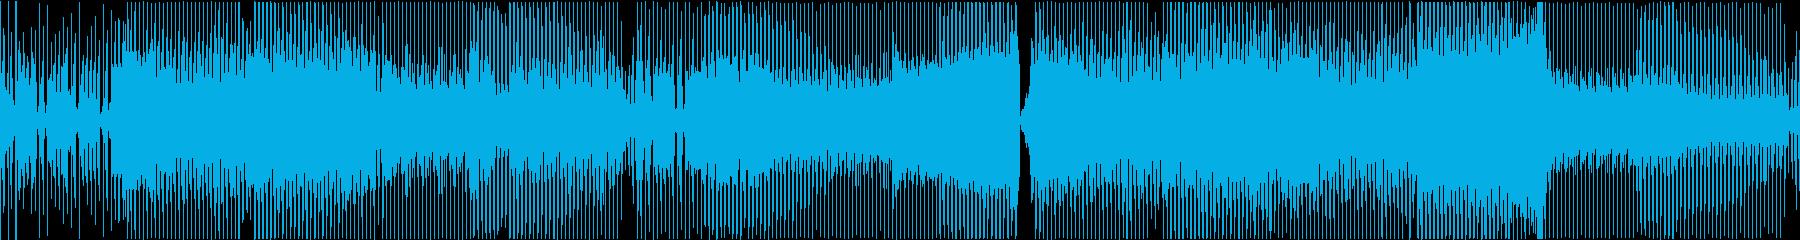 EDM バラエティ 情熱 パッション Lの再生済みの波形